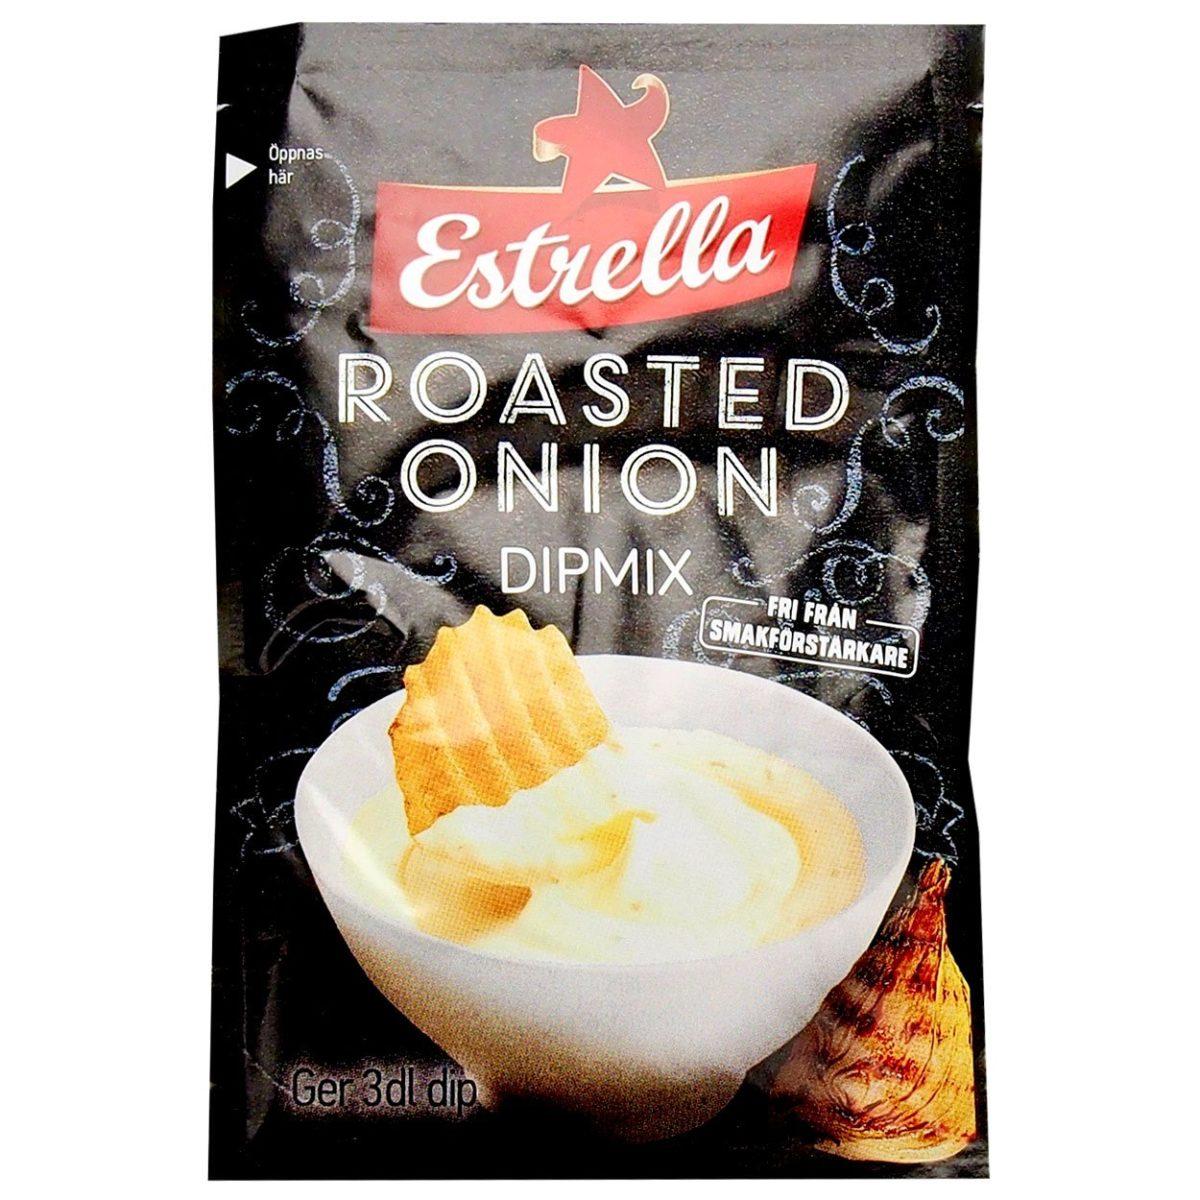 Estrella Dipmix Roasted Onion (24g) 1